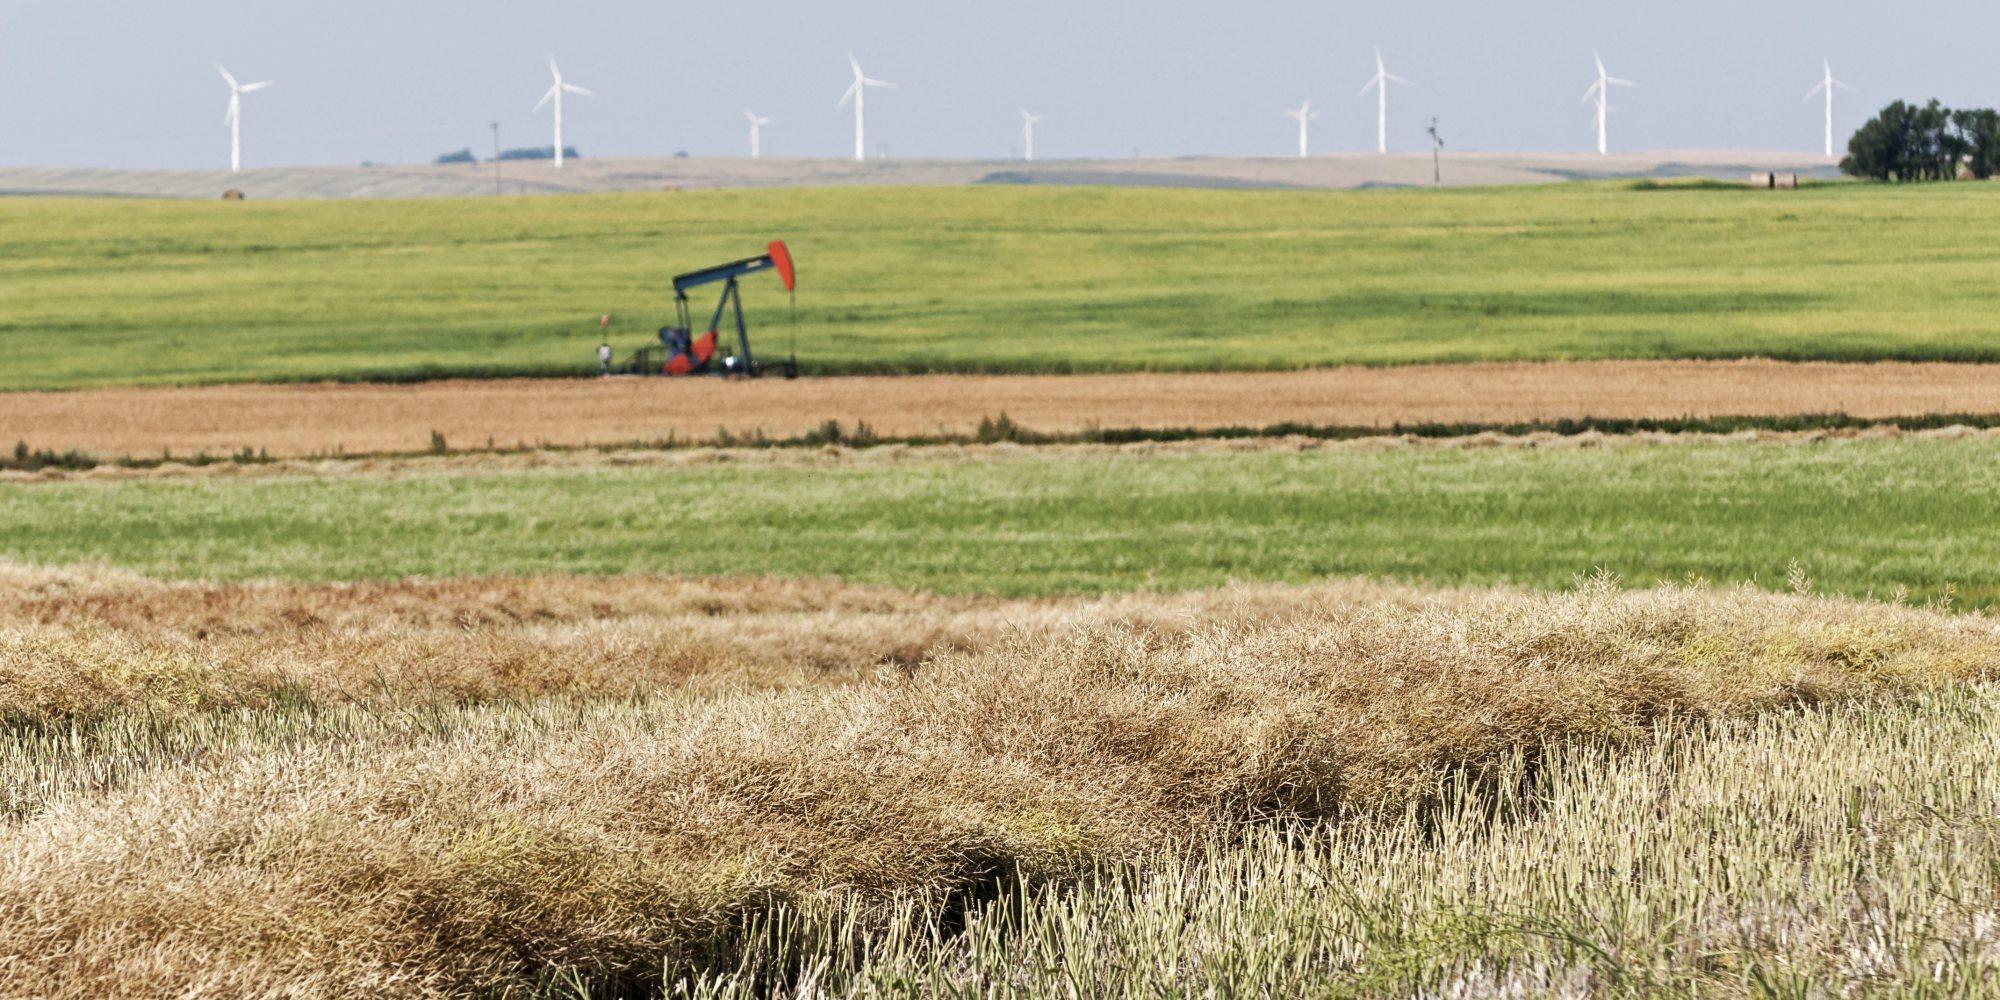 Saskatchewan Family Loses 3 Children In Farm Accidents - Huffington Post Canada